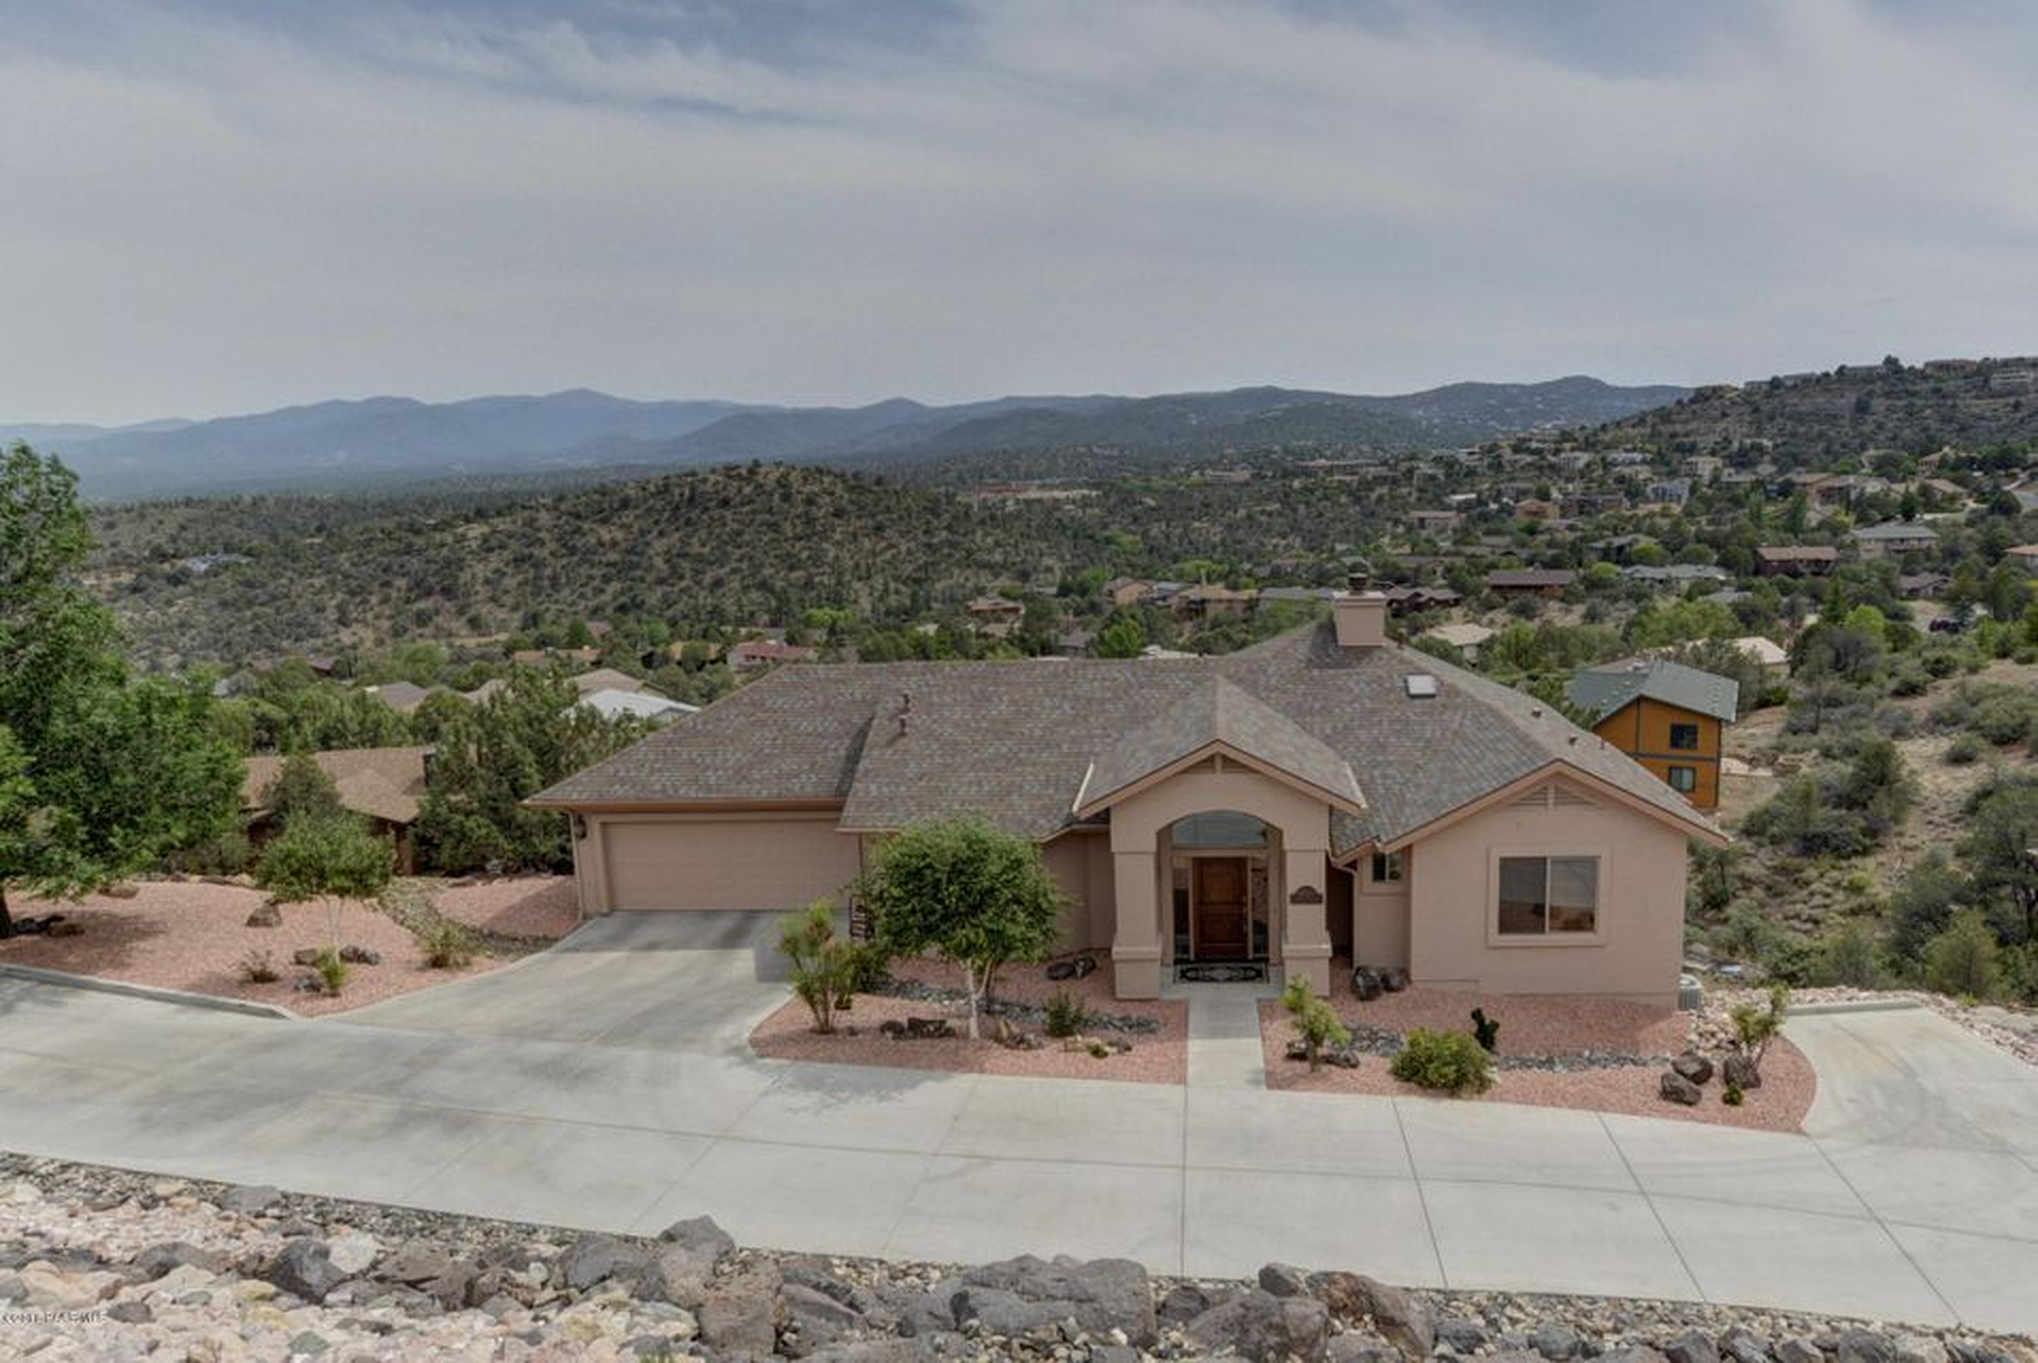 MLS 996008 4600 Hornet Drive Building 4600, Prescott, AZ Prescott AZ Yavapai Hills